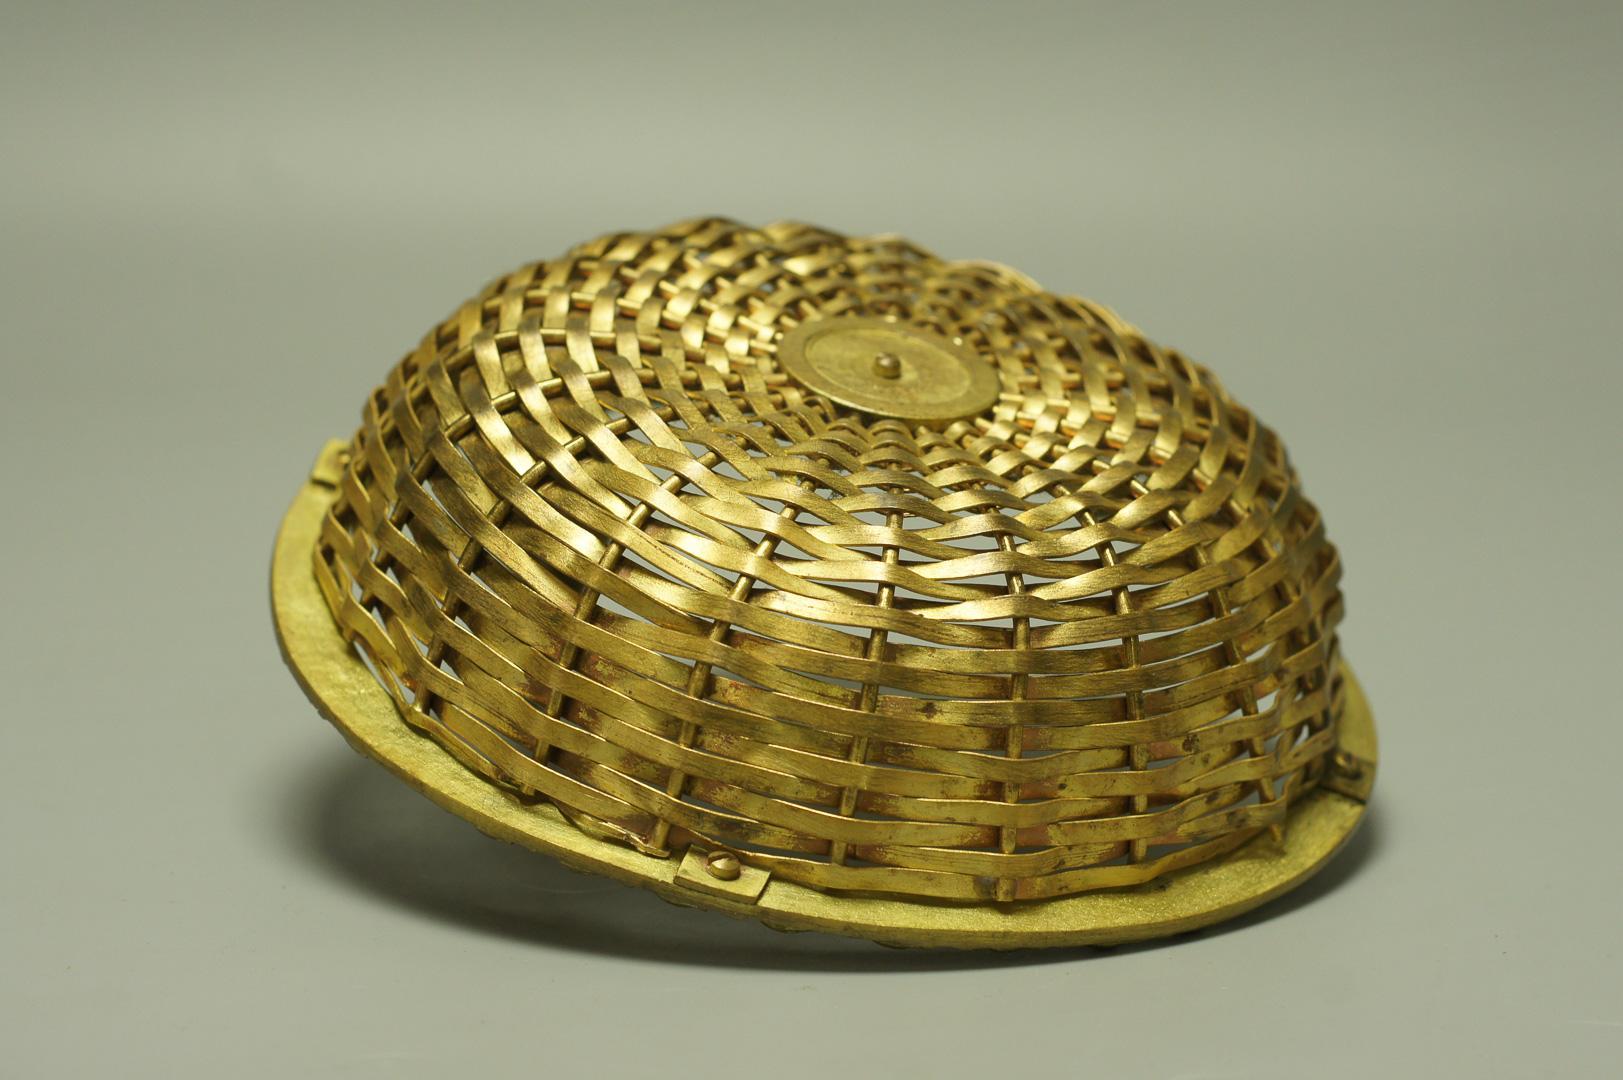 Корзинка ваза плетёная попугай бронза латунь